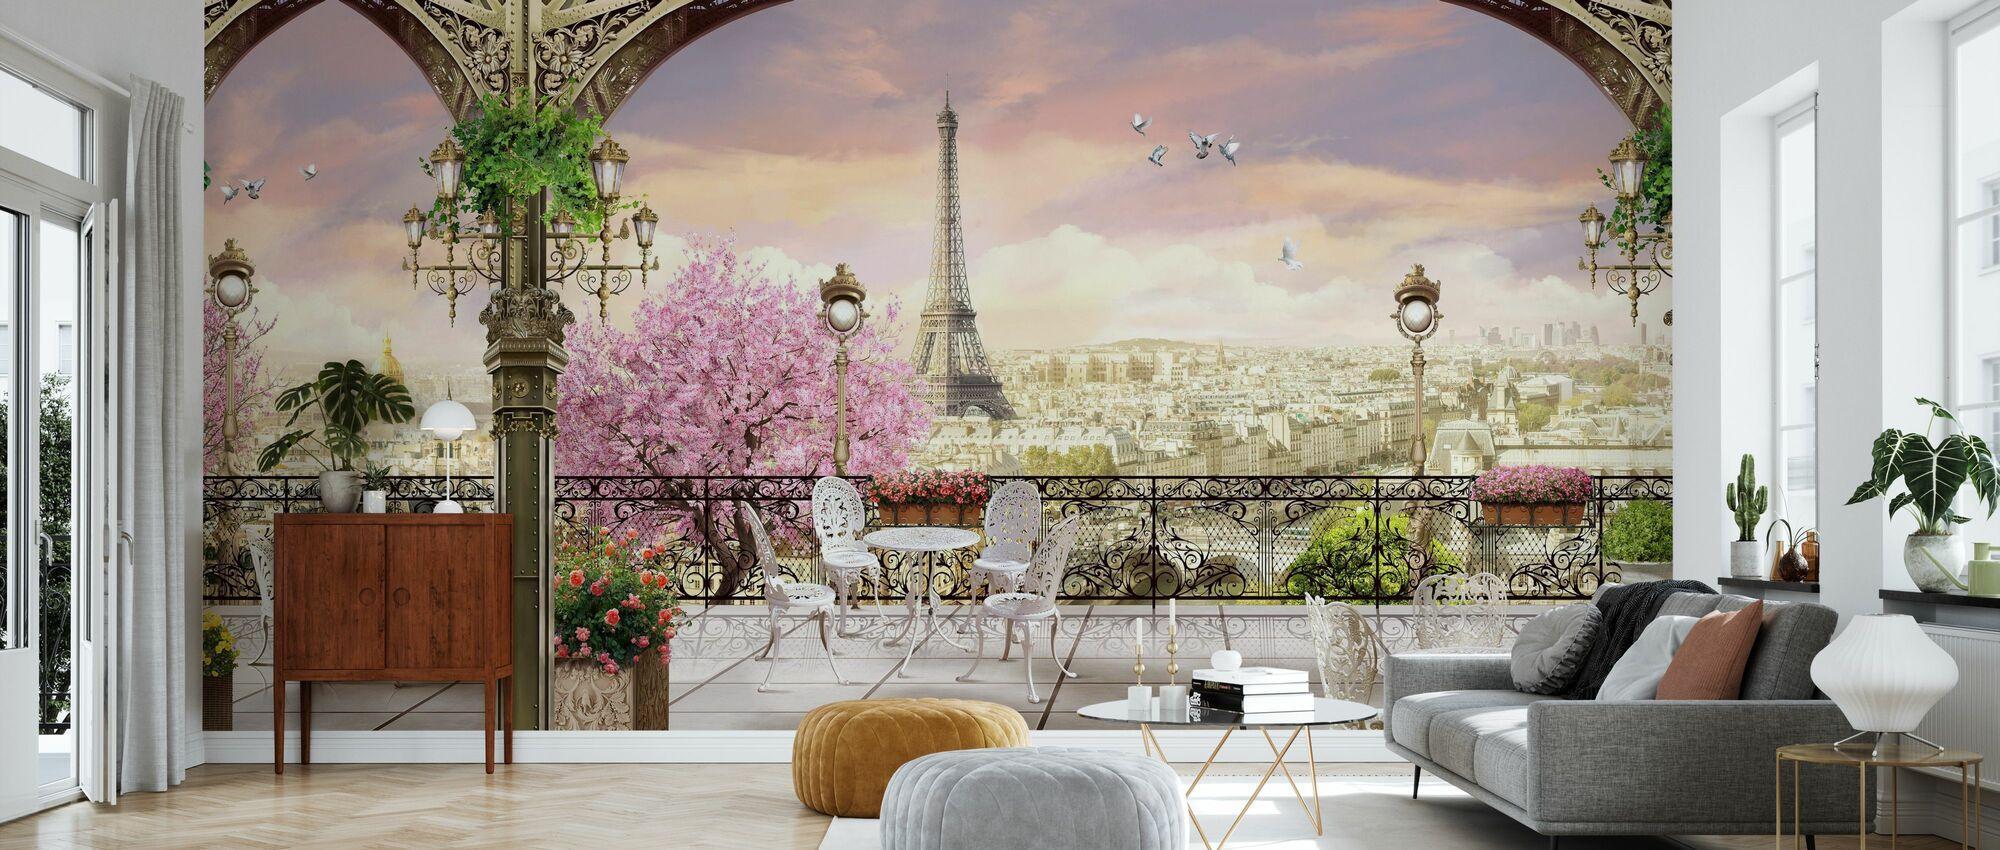 Paris Terrace - Wallpaper - Living Room